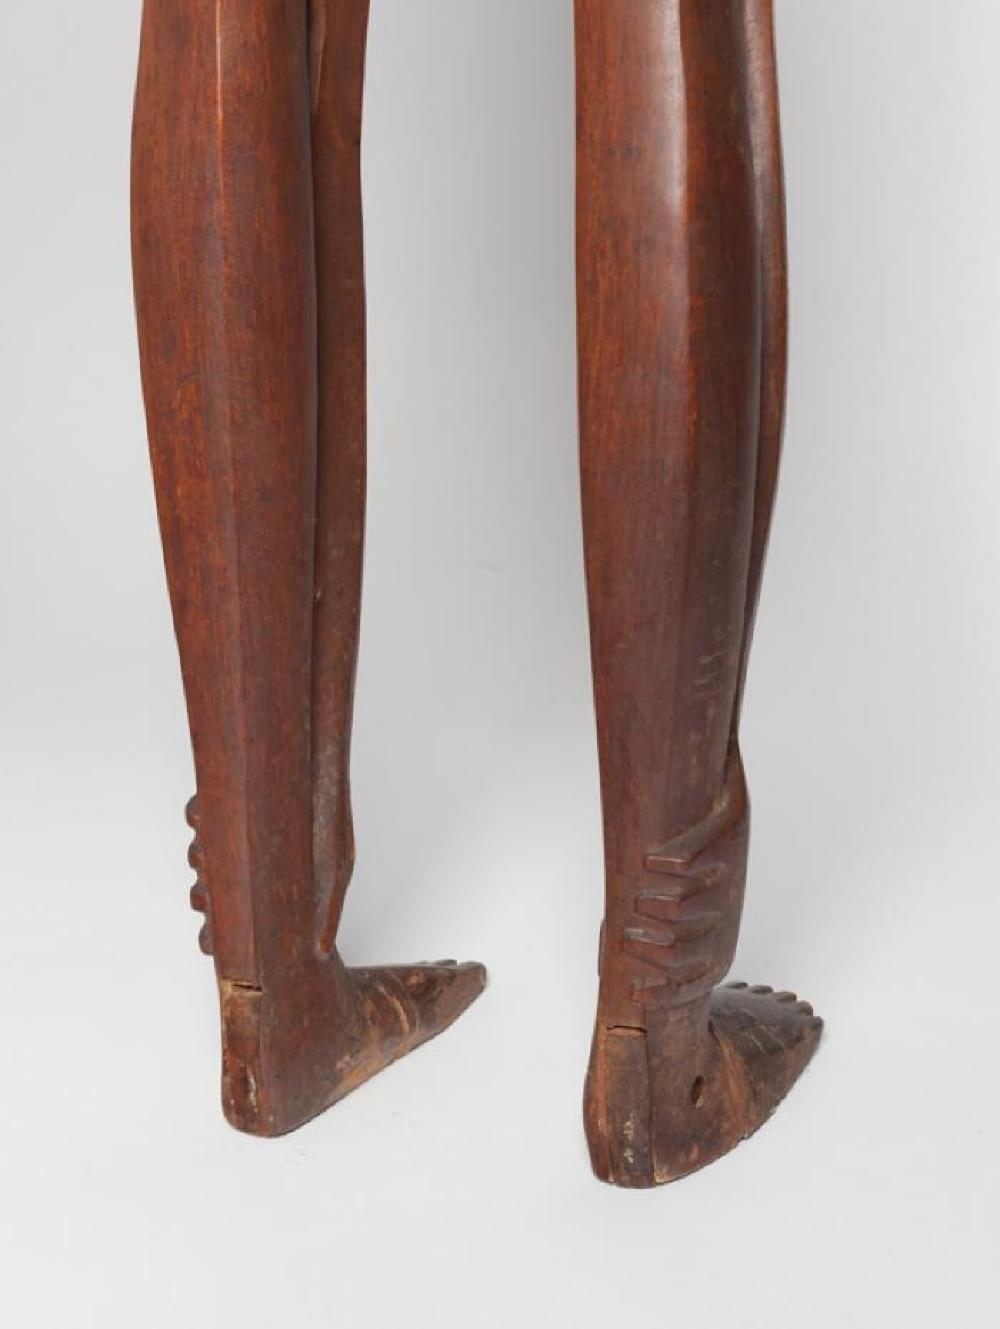 Boy Looking through Legs, image 4